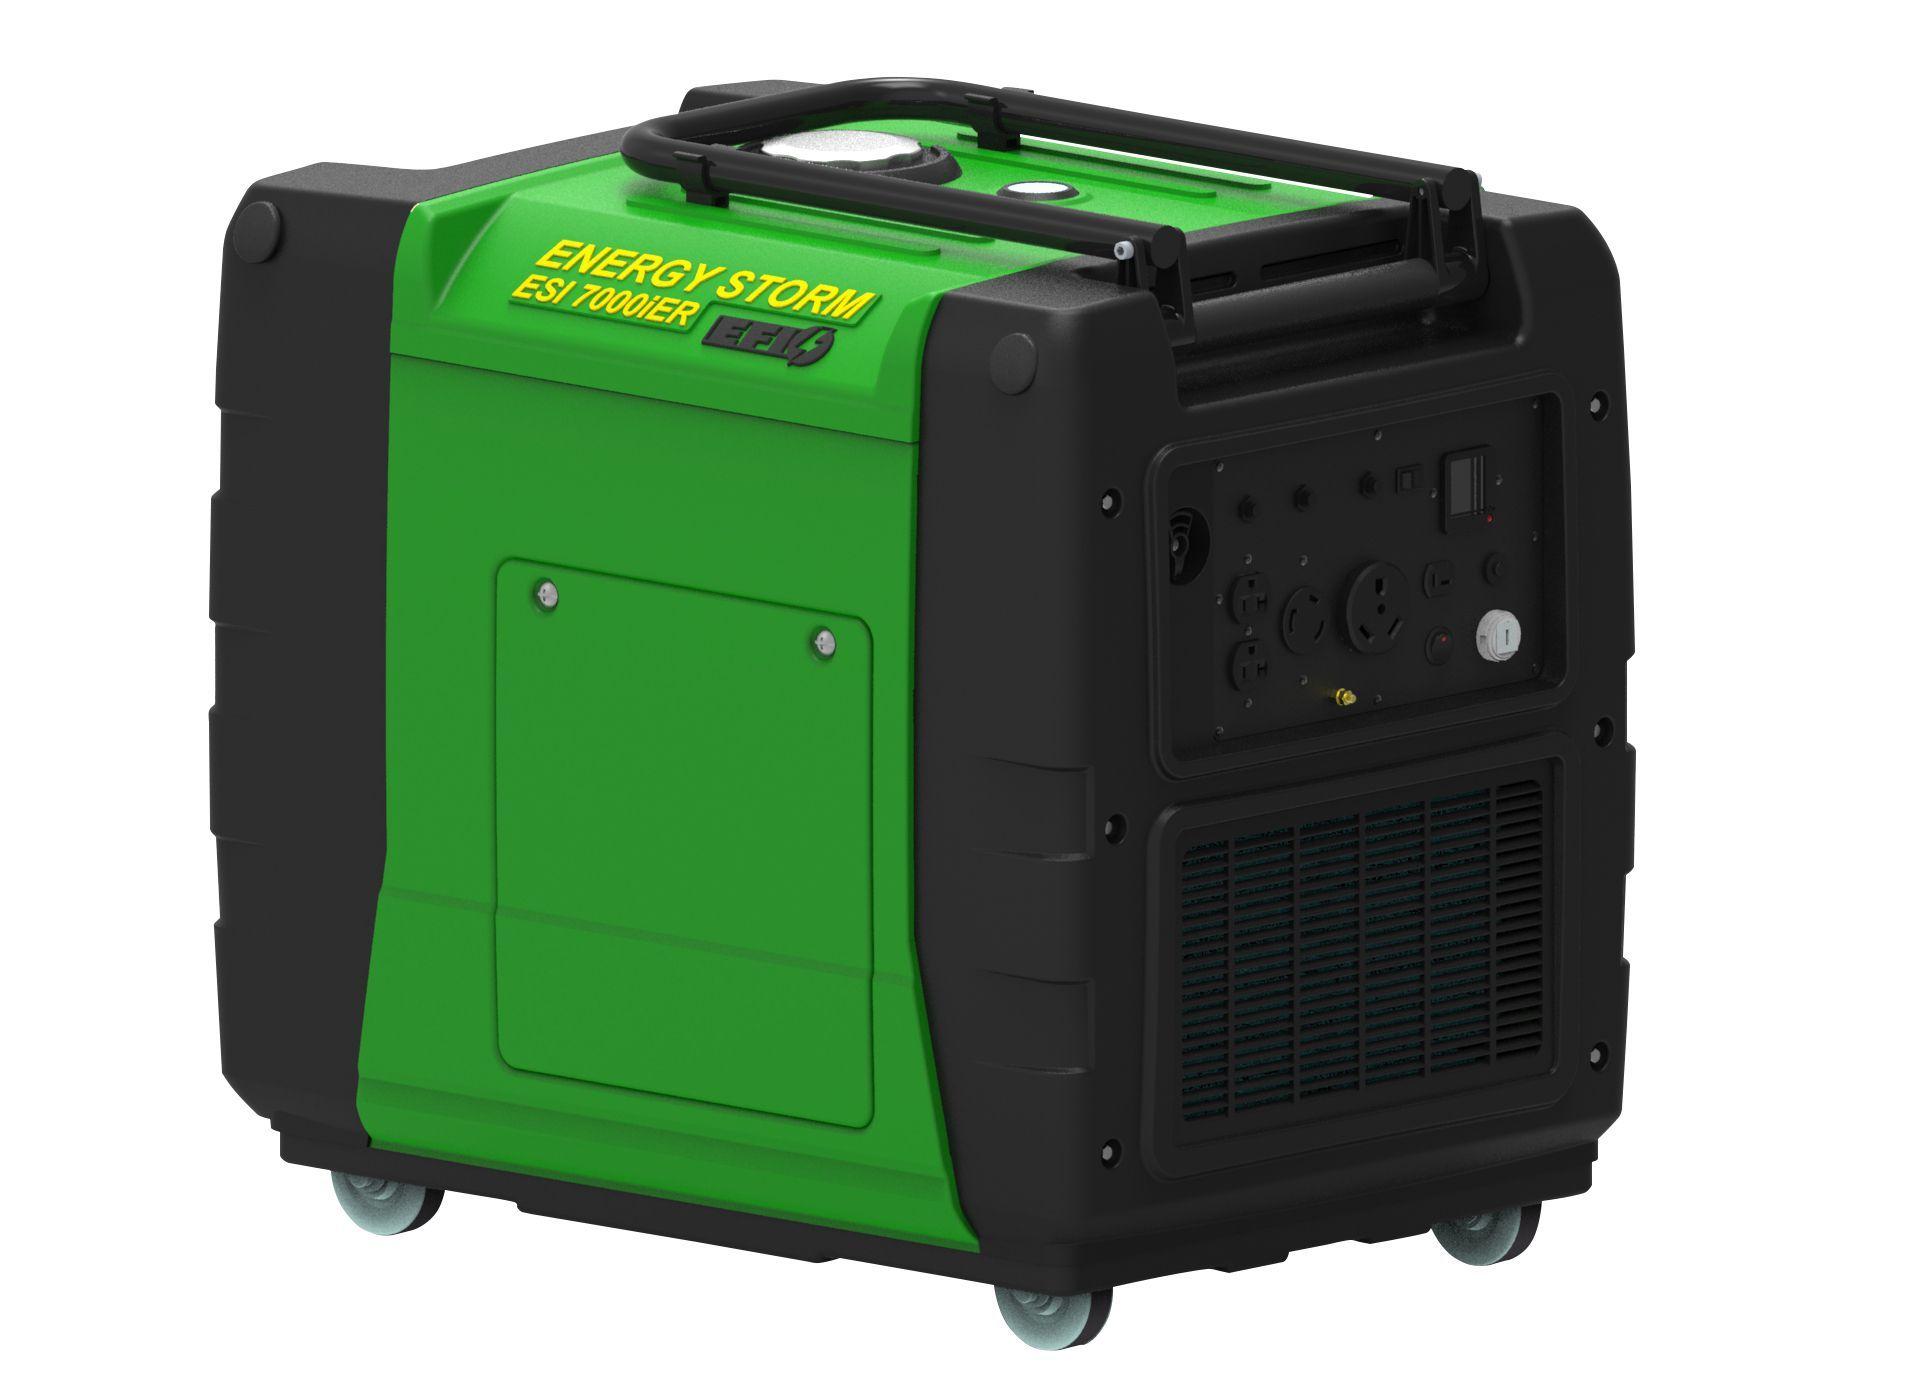 Energy Storm 7000ier Efi Lifan Power Usa Power Equipment